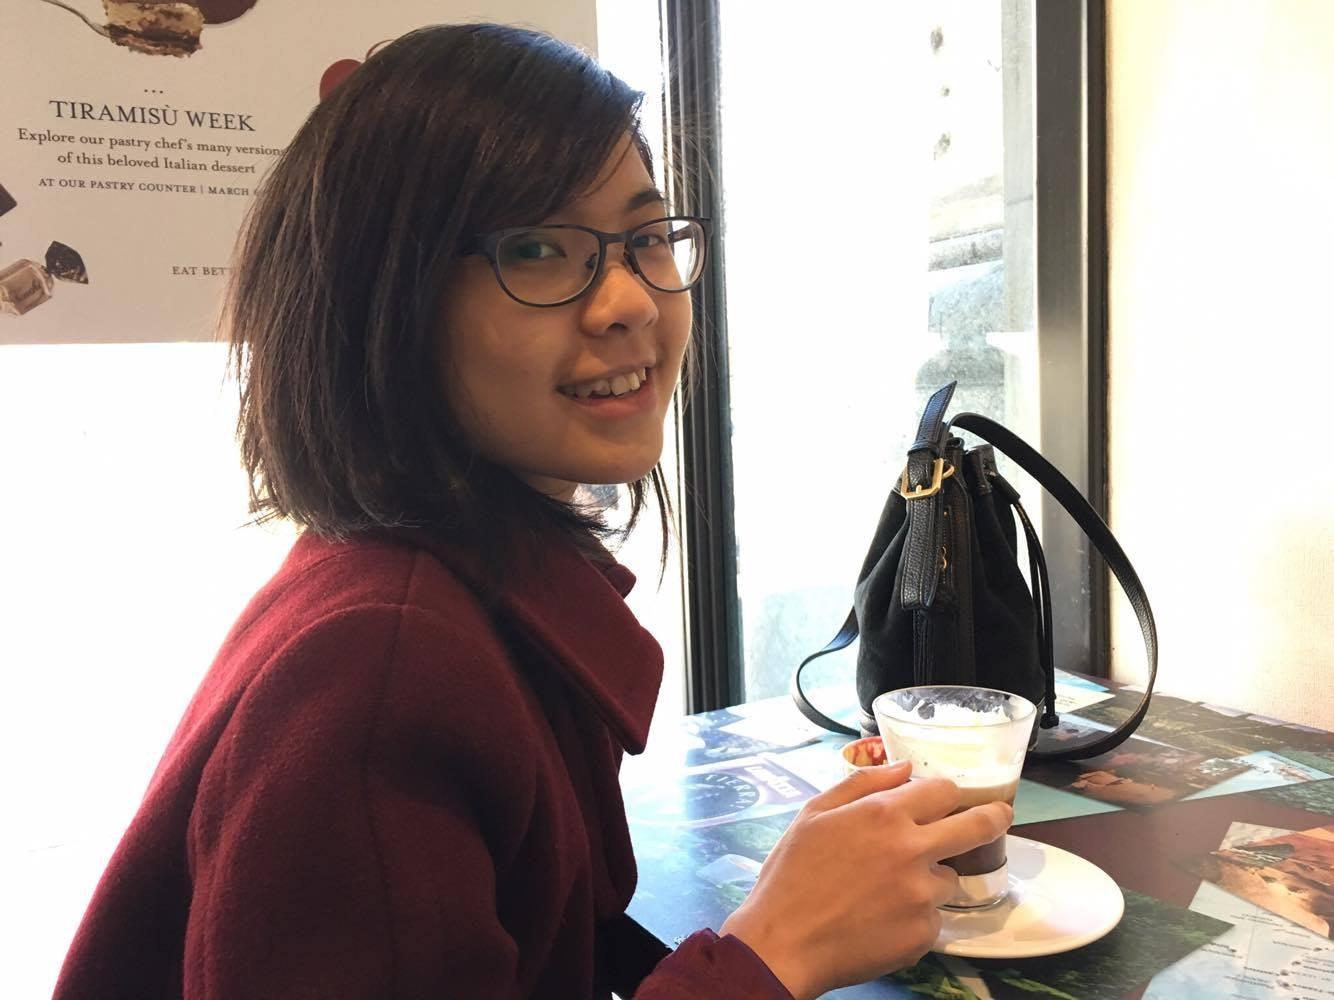 Minh-Tram Nguyen